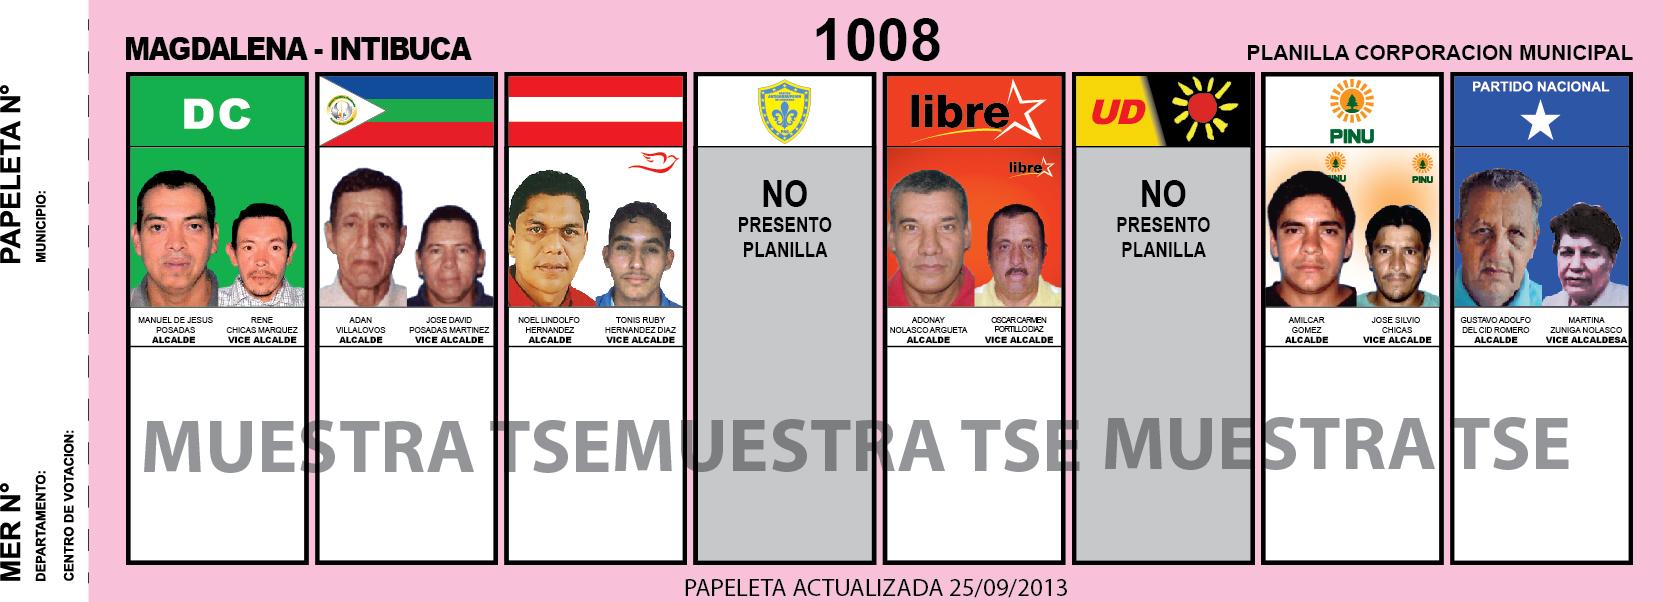 CANDIDATOS 2013 MUNICIPIO MAGDALENA - INTIBUCA - HONDURAS